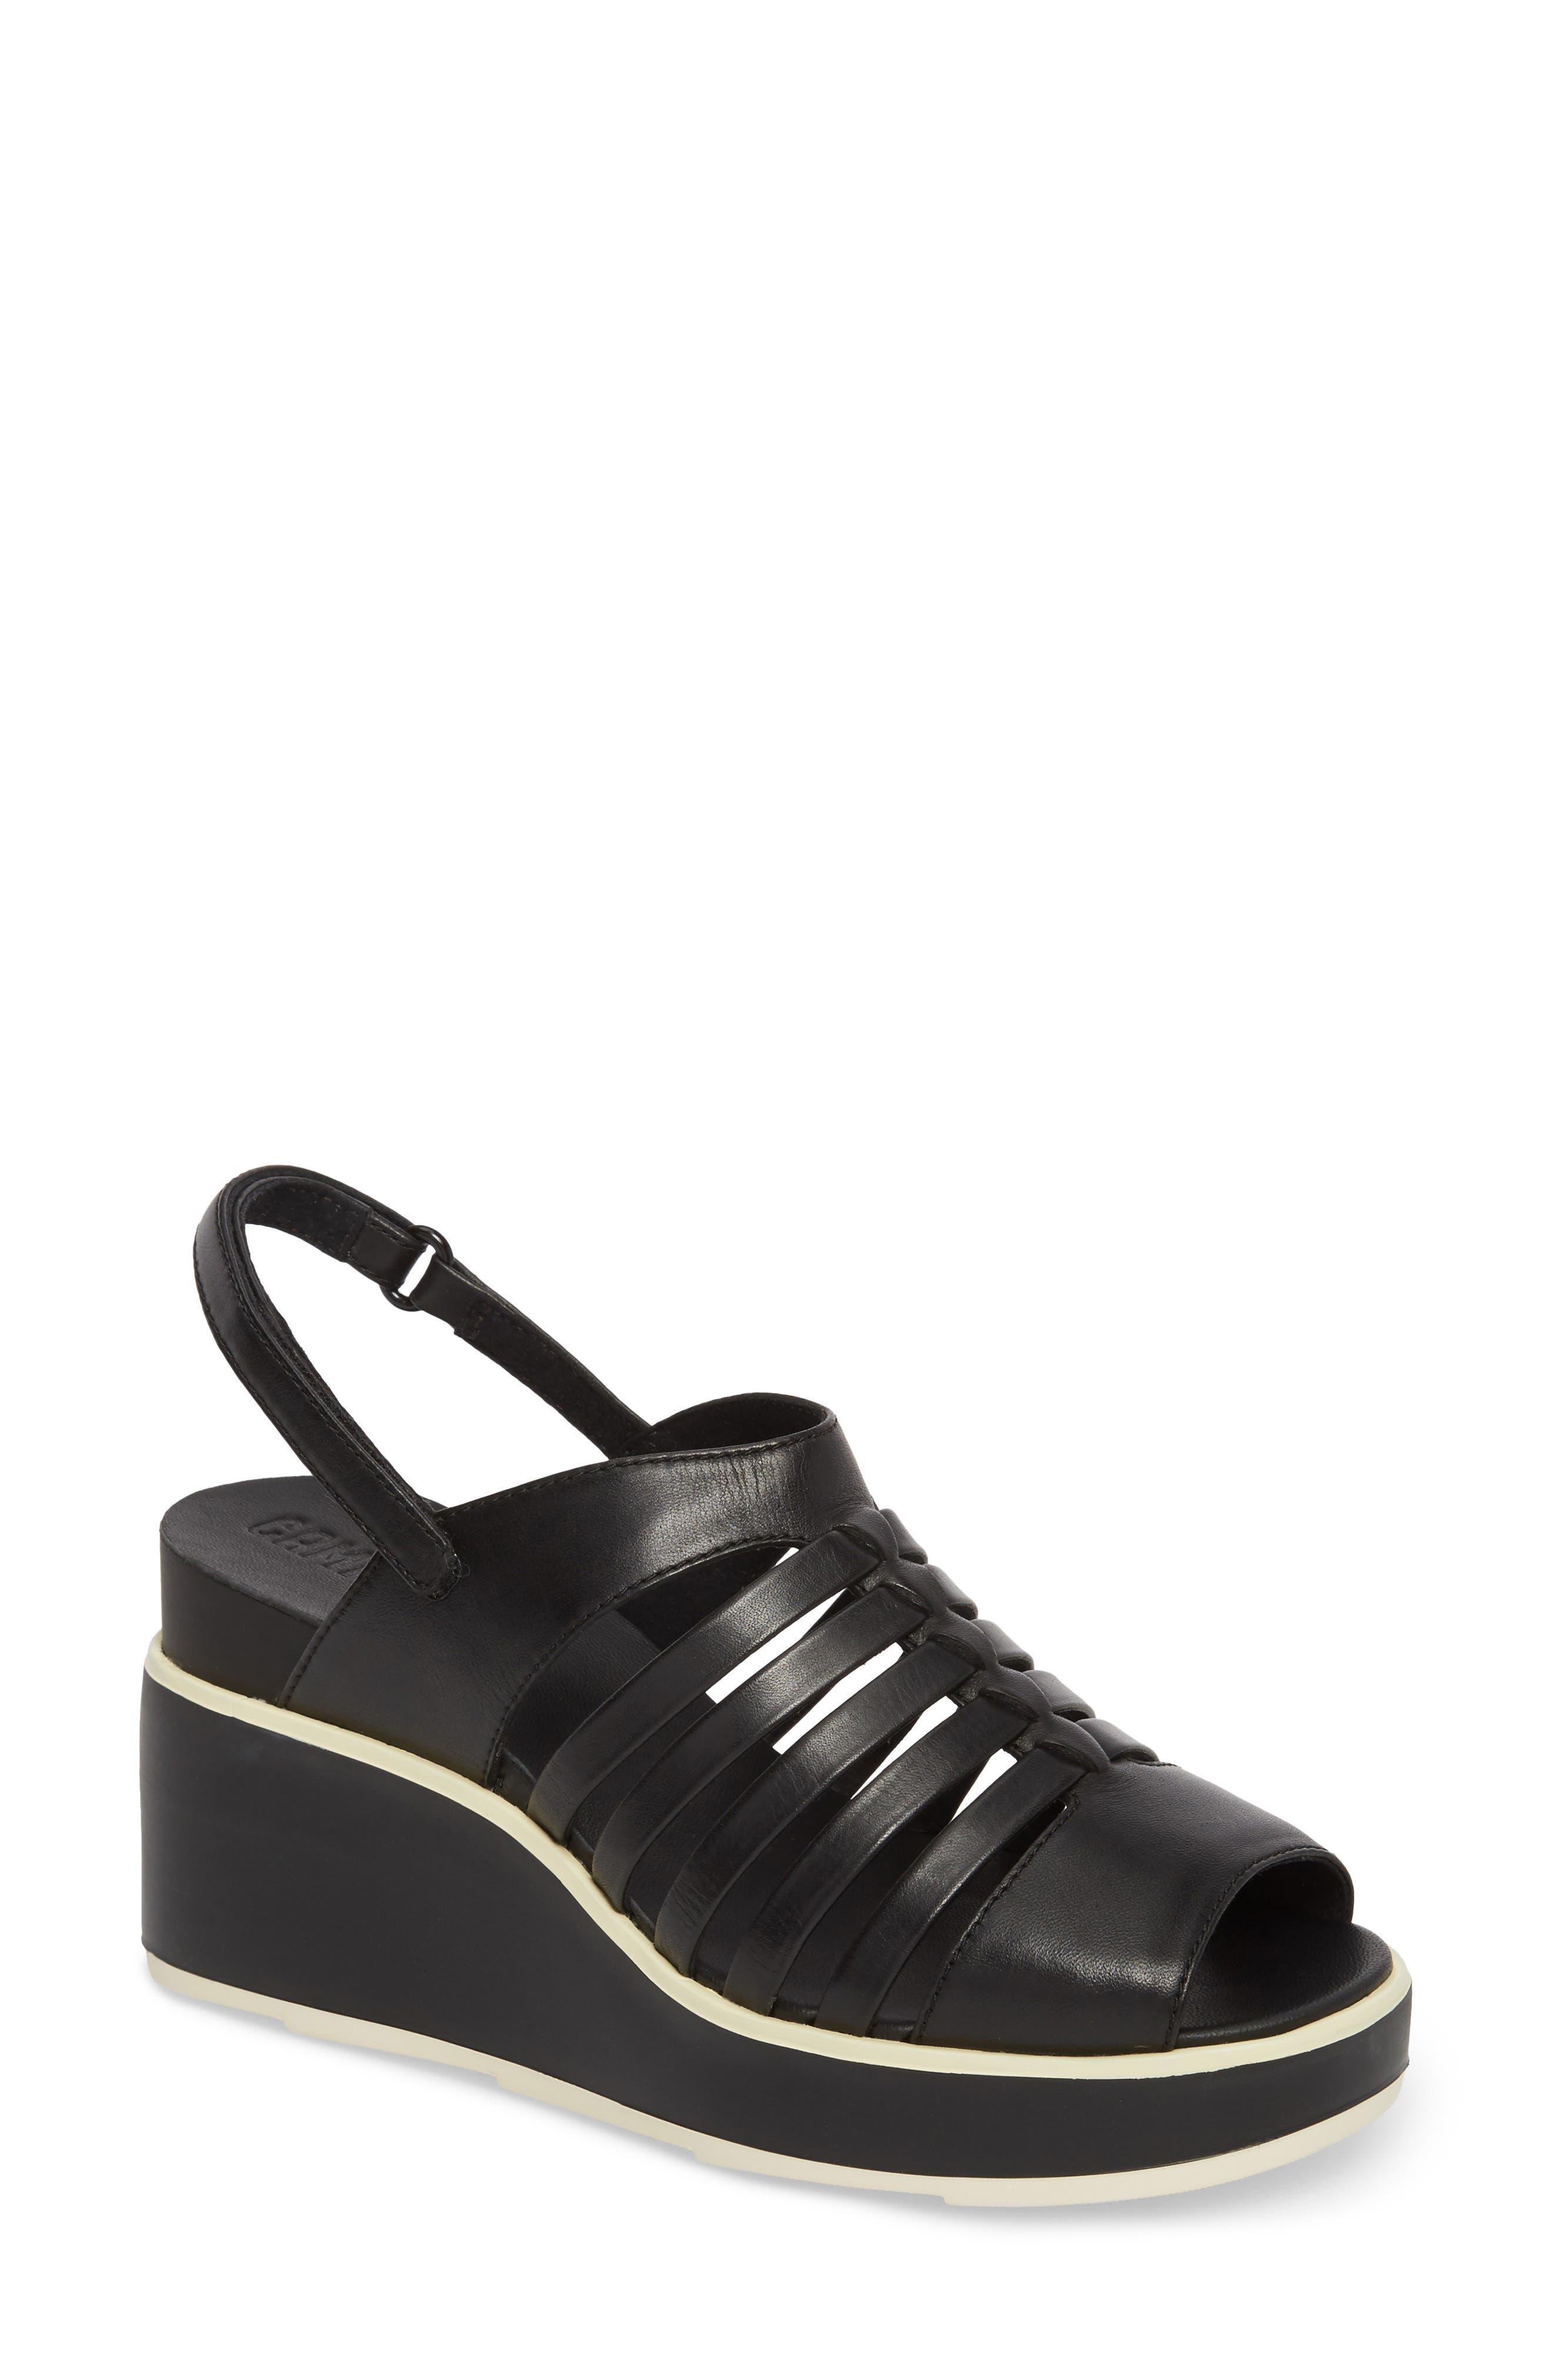 Tropik Strappy Wedge Sandal,                         Main,                         color, 002